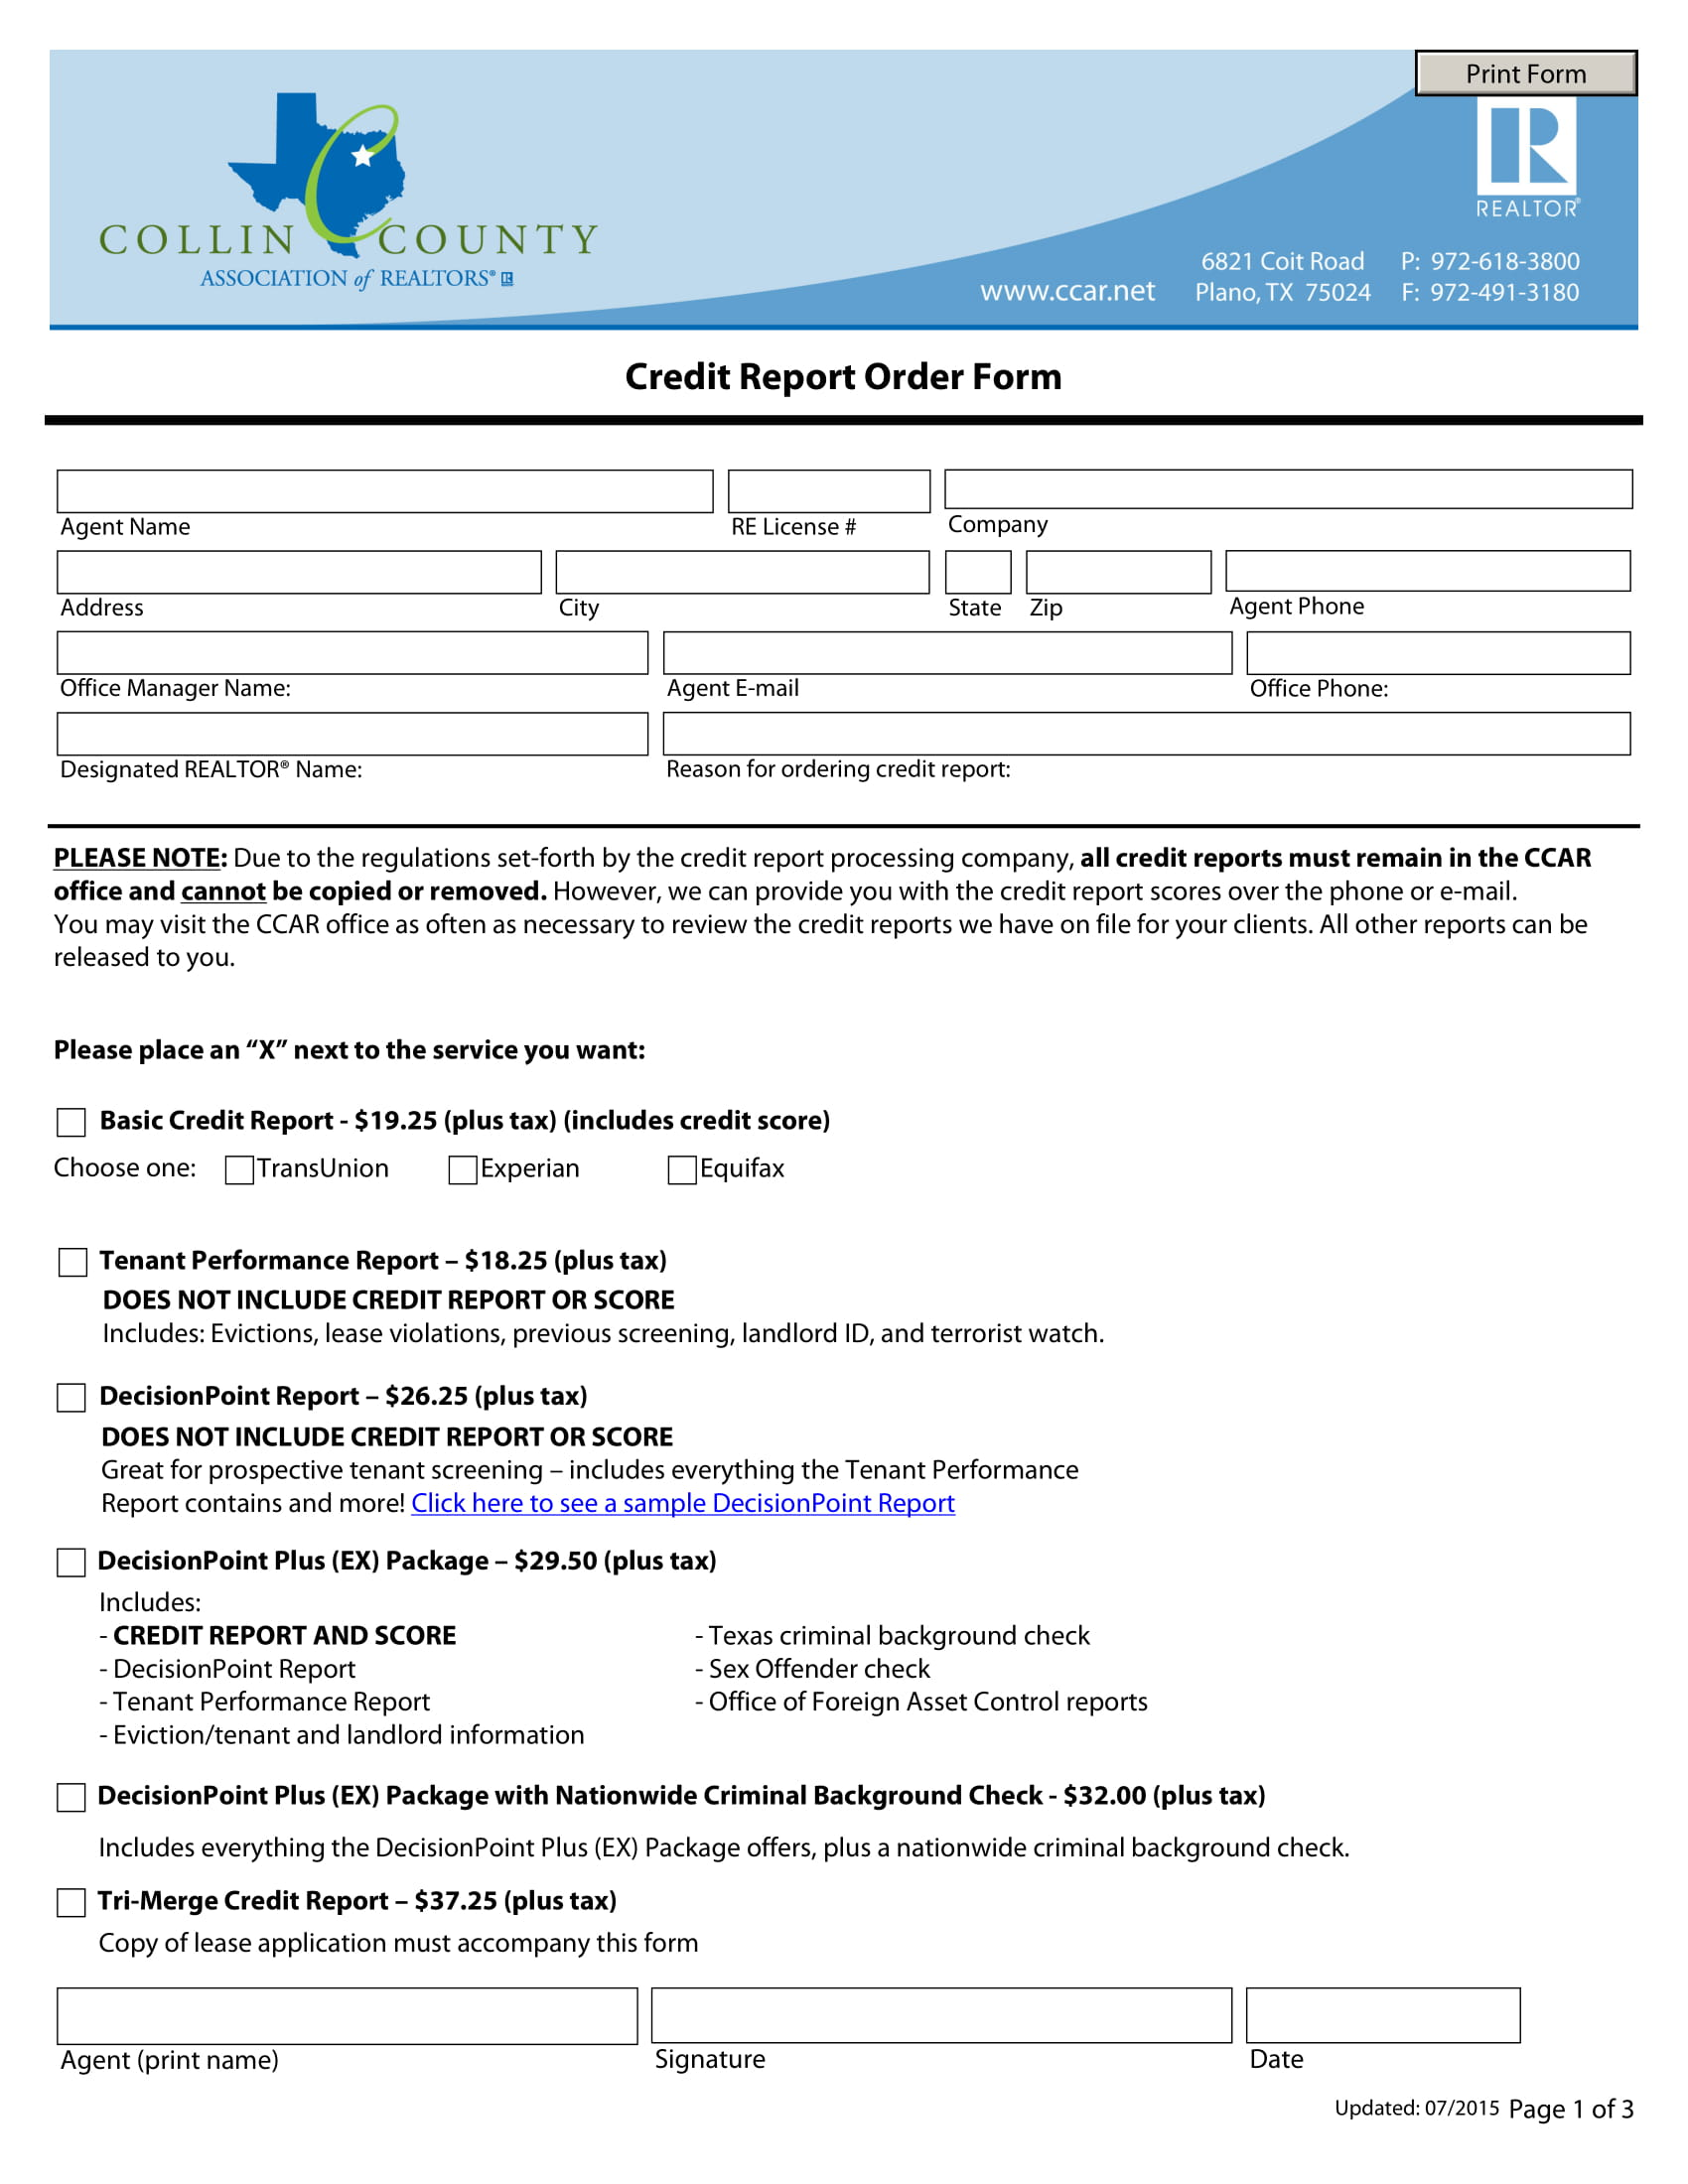 credit report order form 1